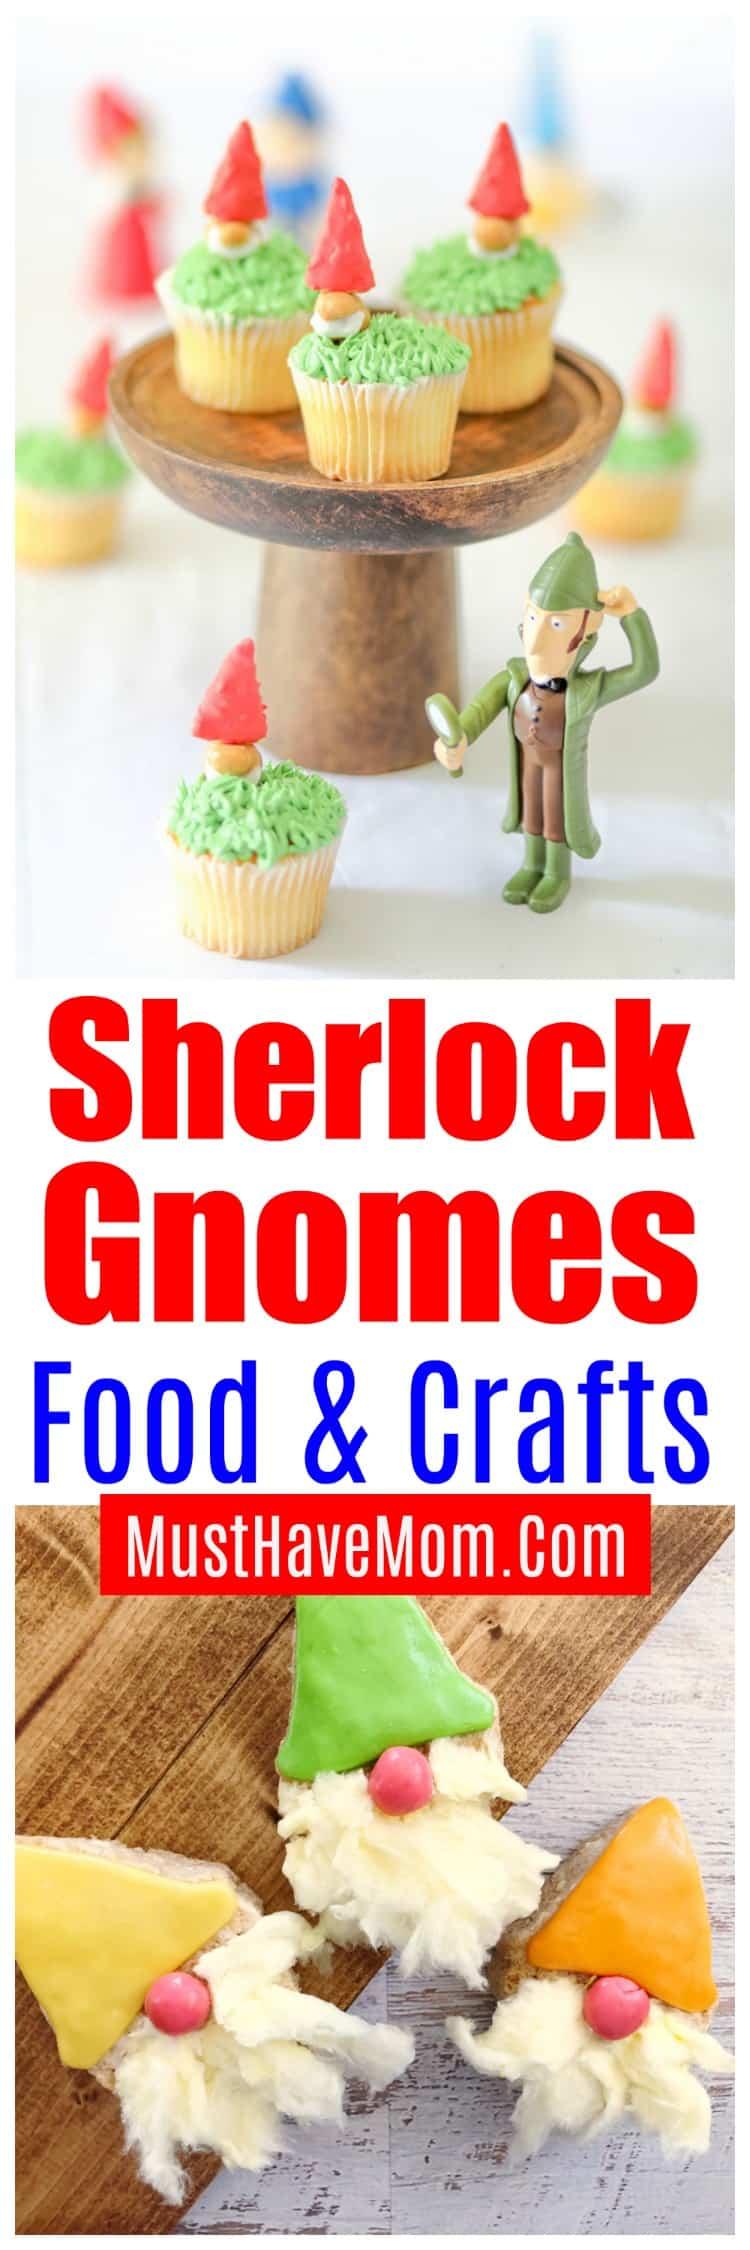 sherlock gnomes crafts and food